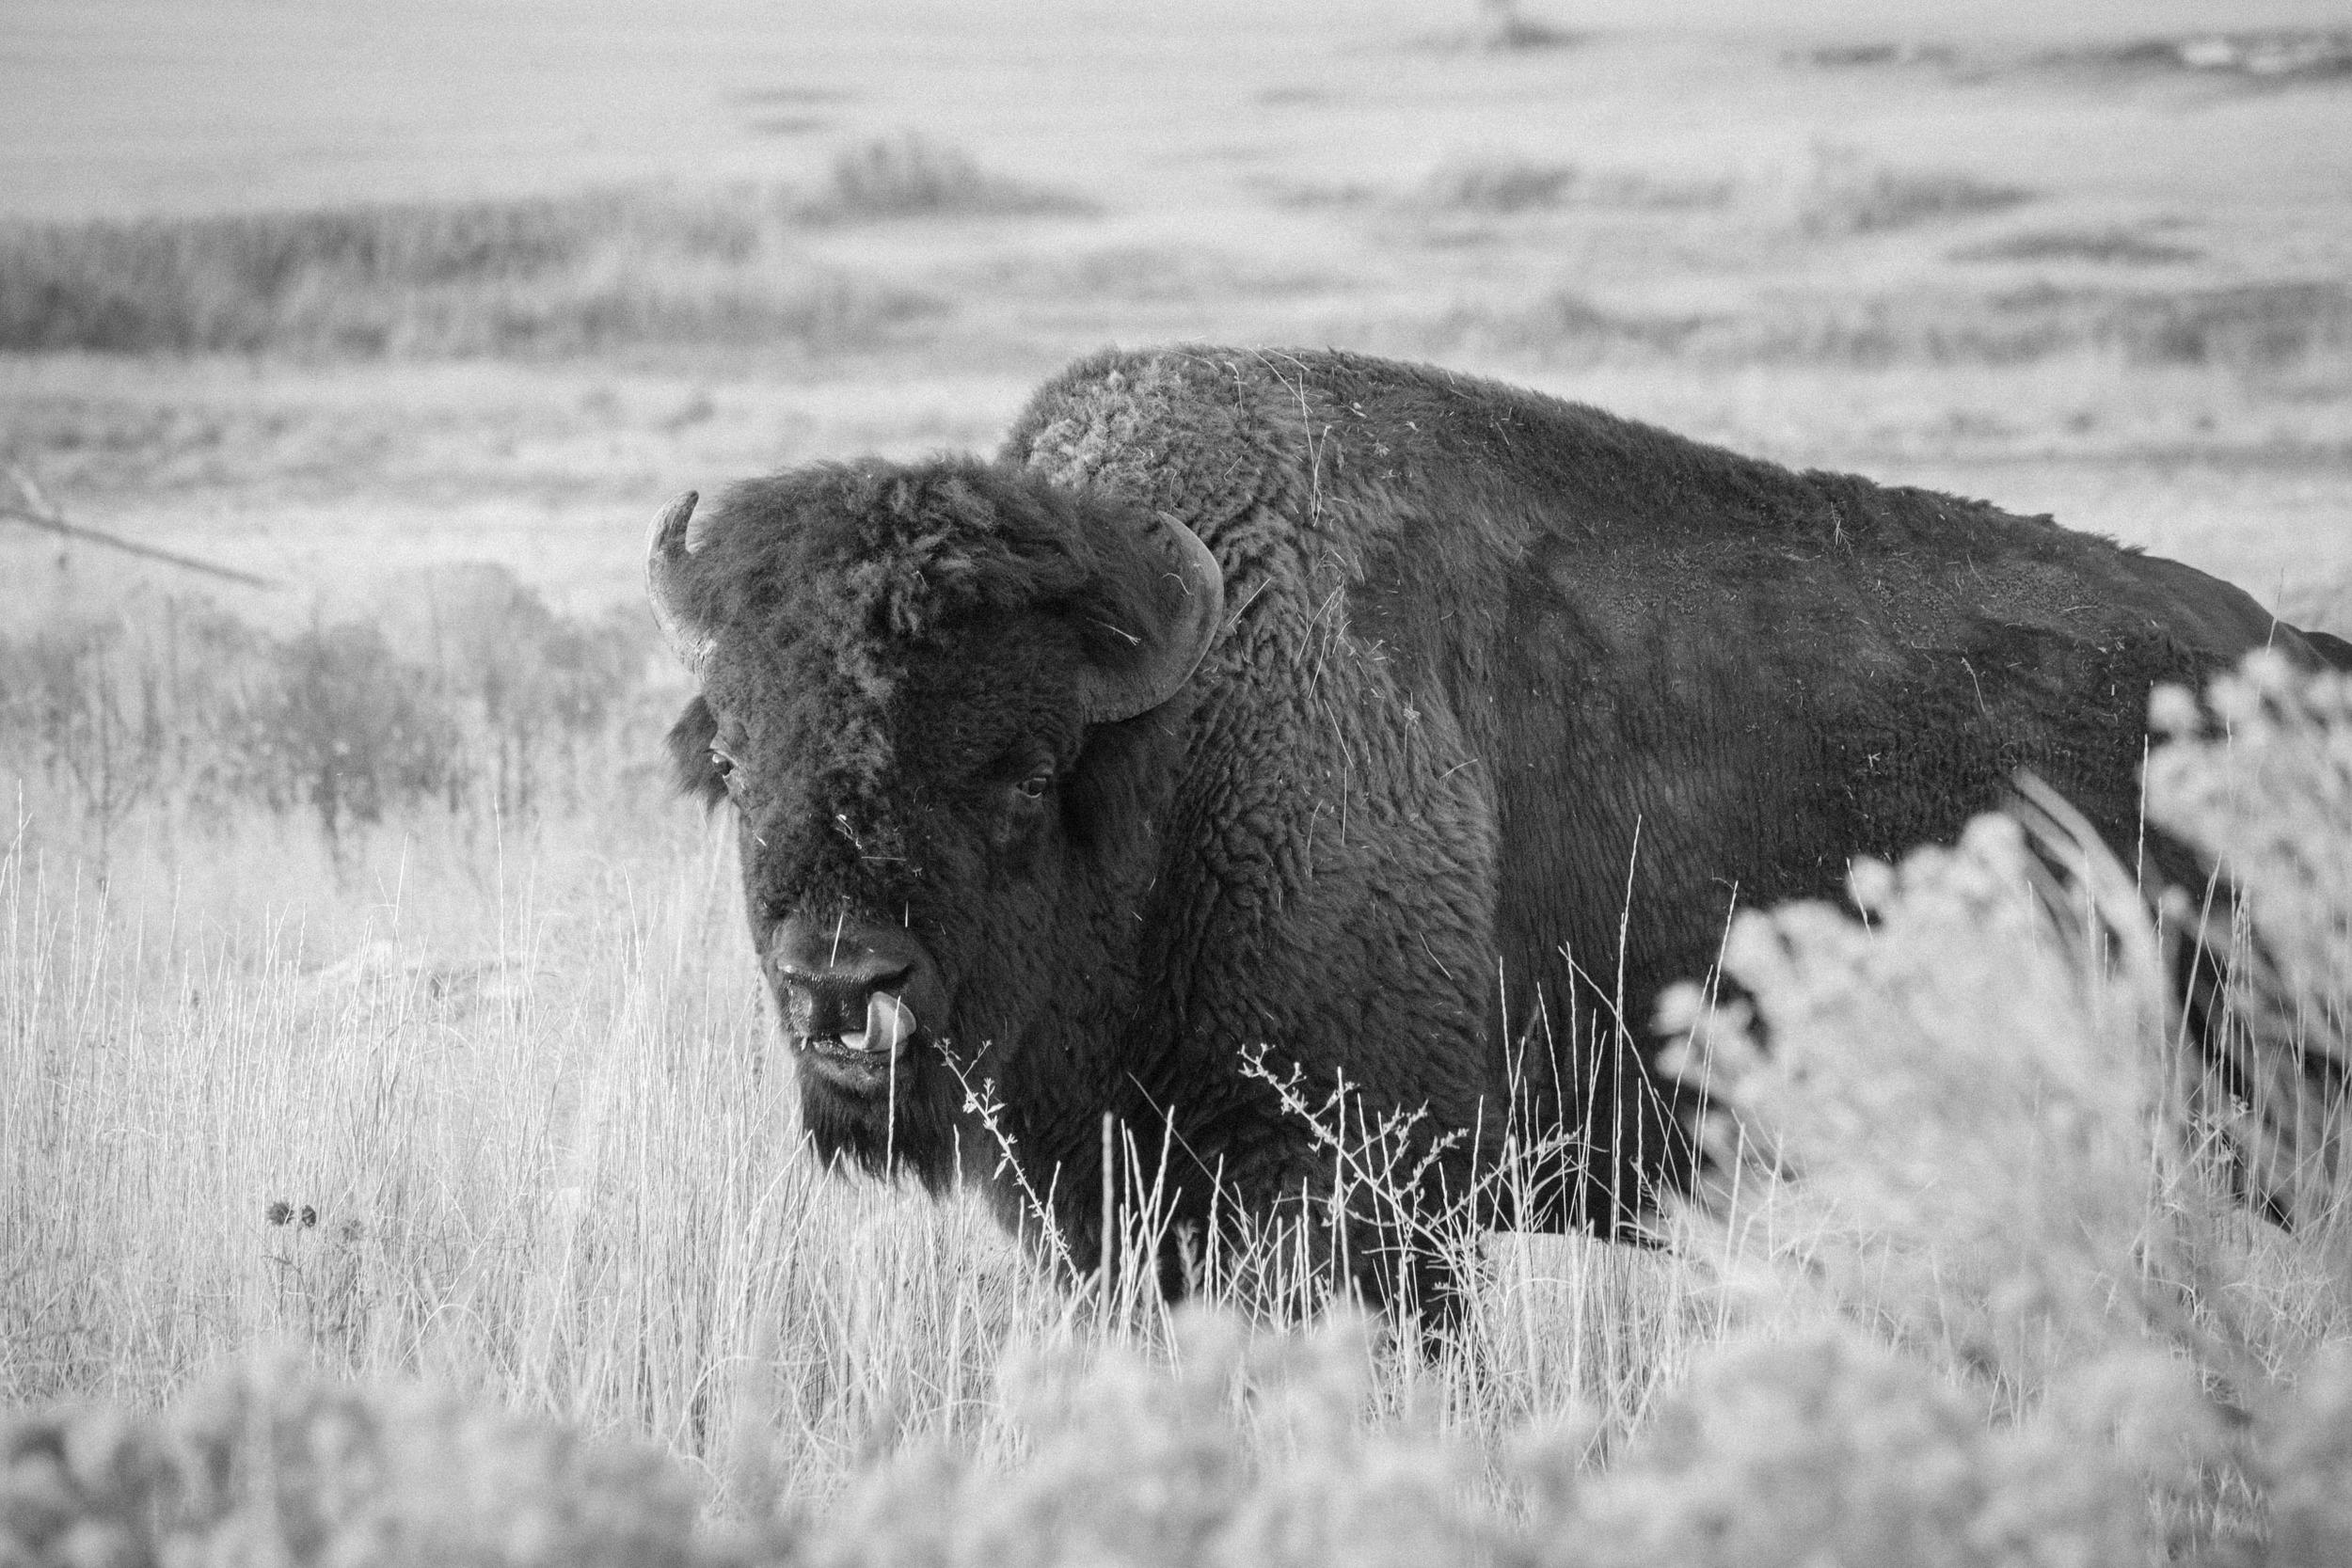 Bison on Antelope Island, Utah, United States